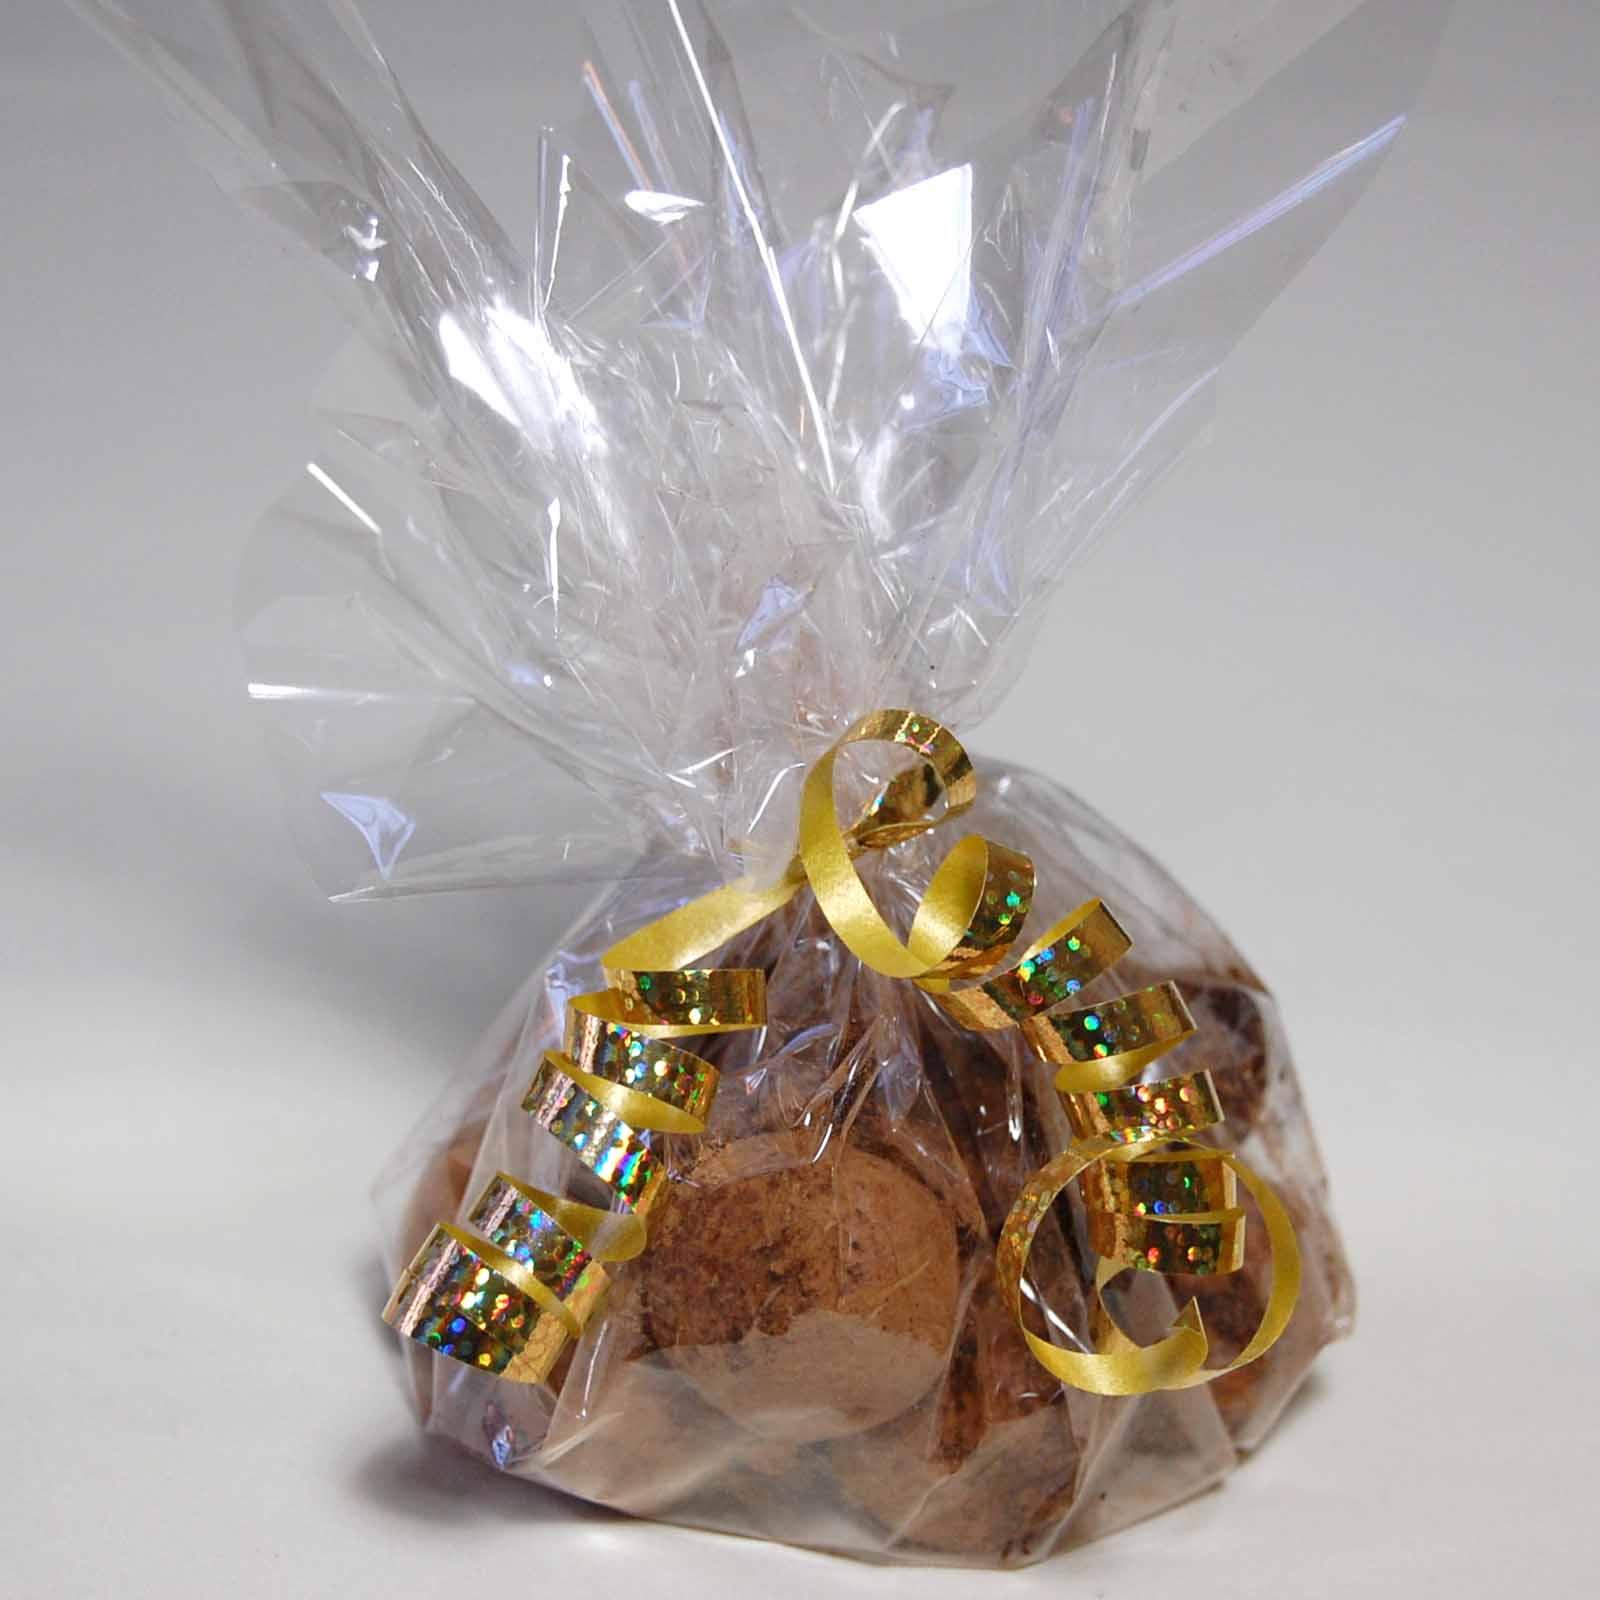 40 X 100 Clear Cellophane Wrap Roll Favor Award Gift Baskets